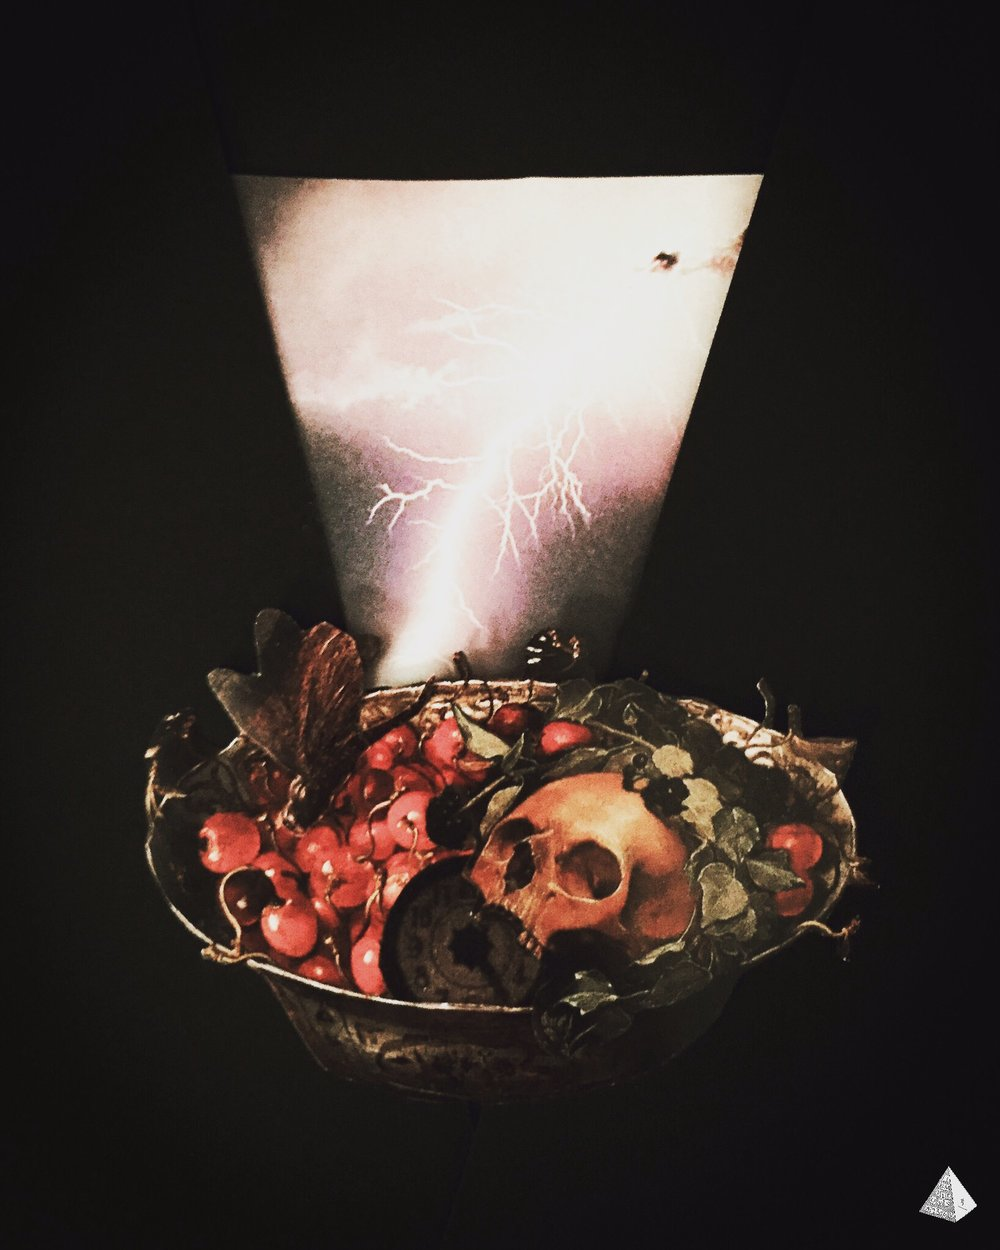 Les Fleurs du Mal: L'Ennemi by Joan Pope (Temple ov Saturn)